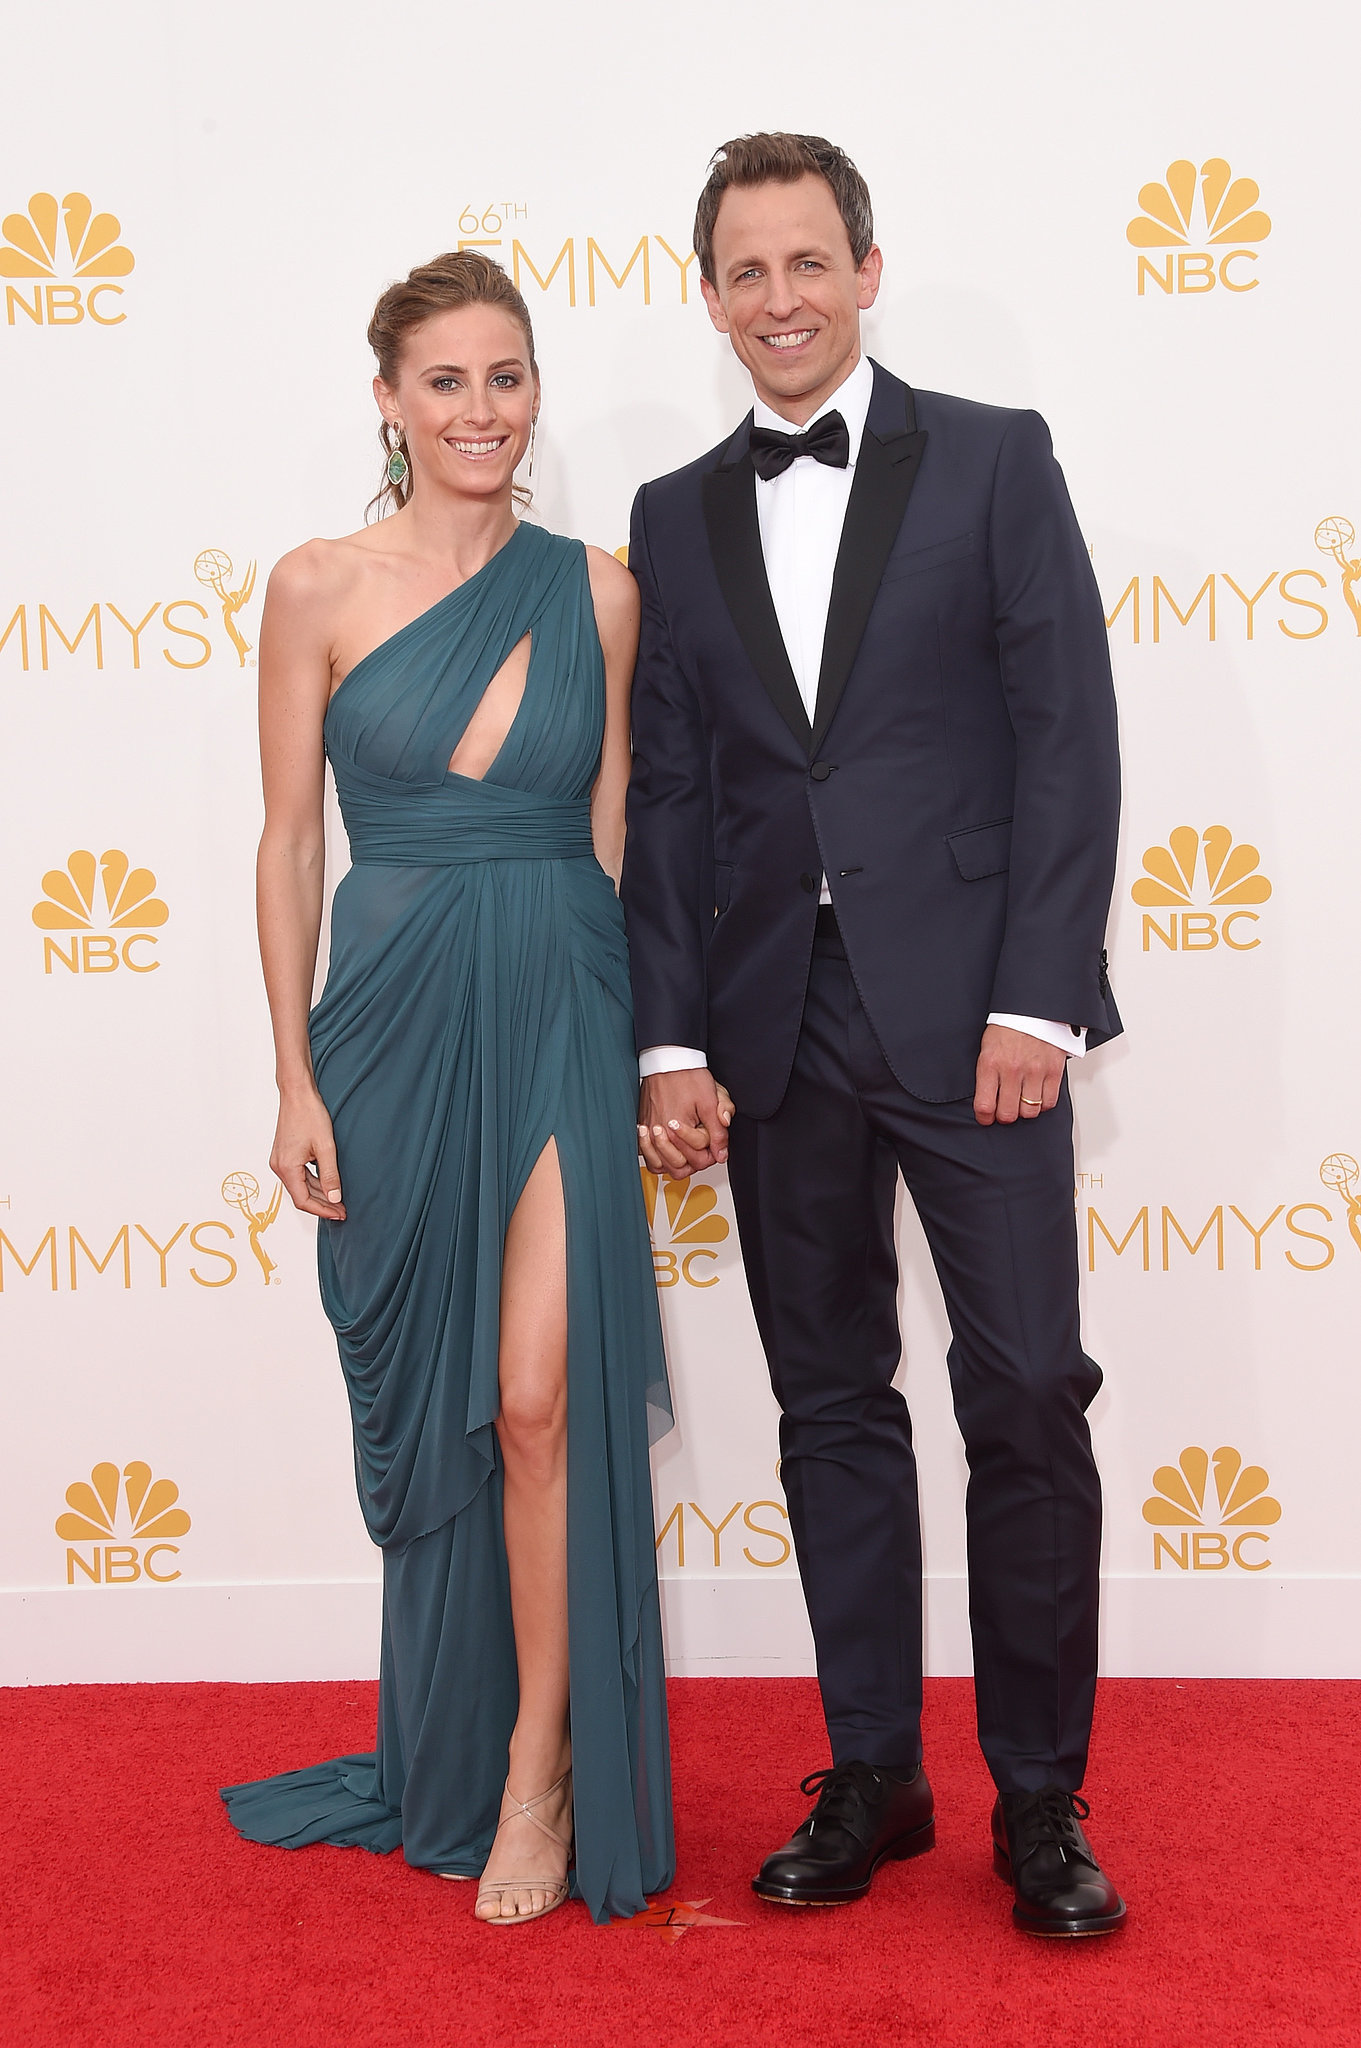 Seth Meyers and Alexi Ashe